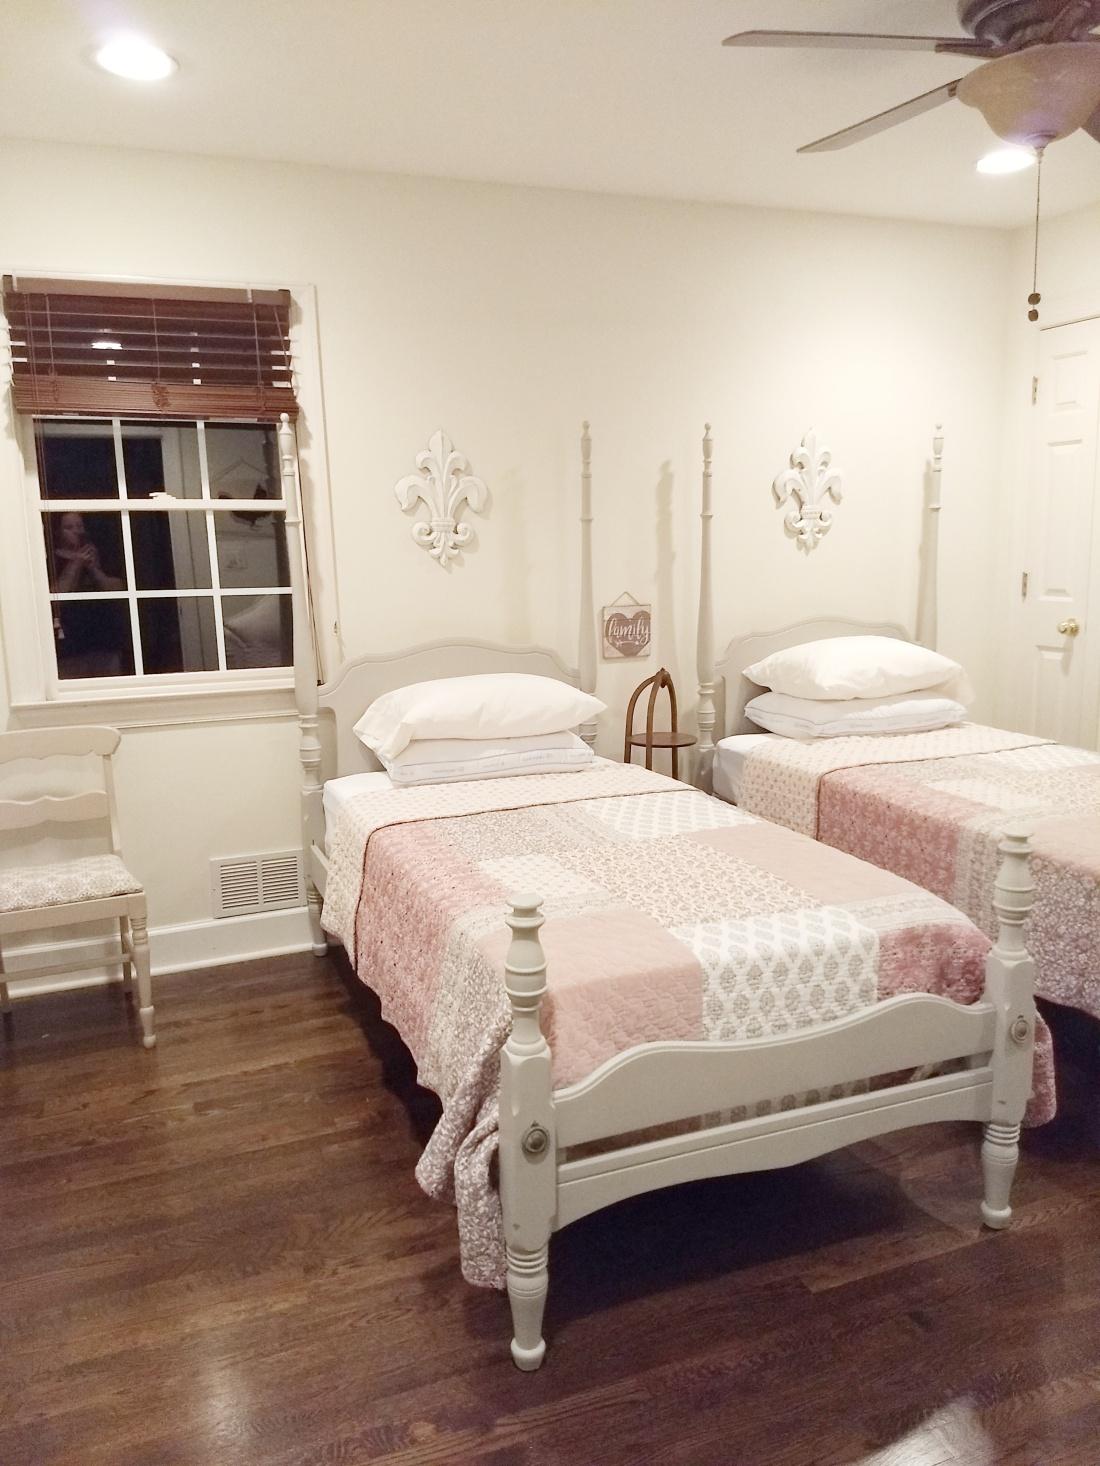 twin beds finished.jpeg